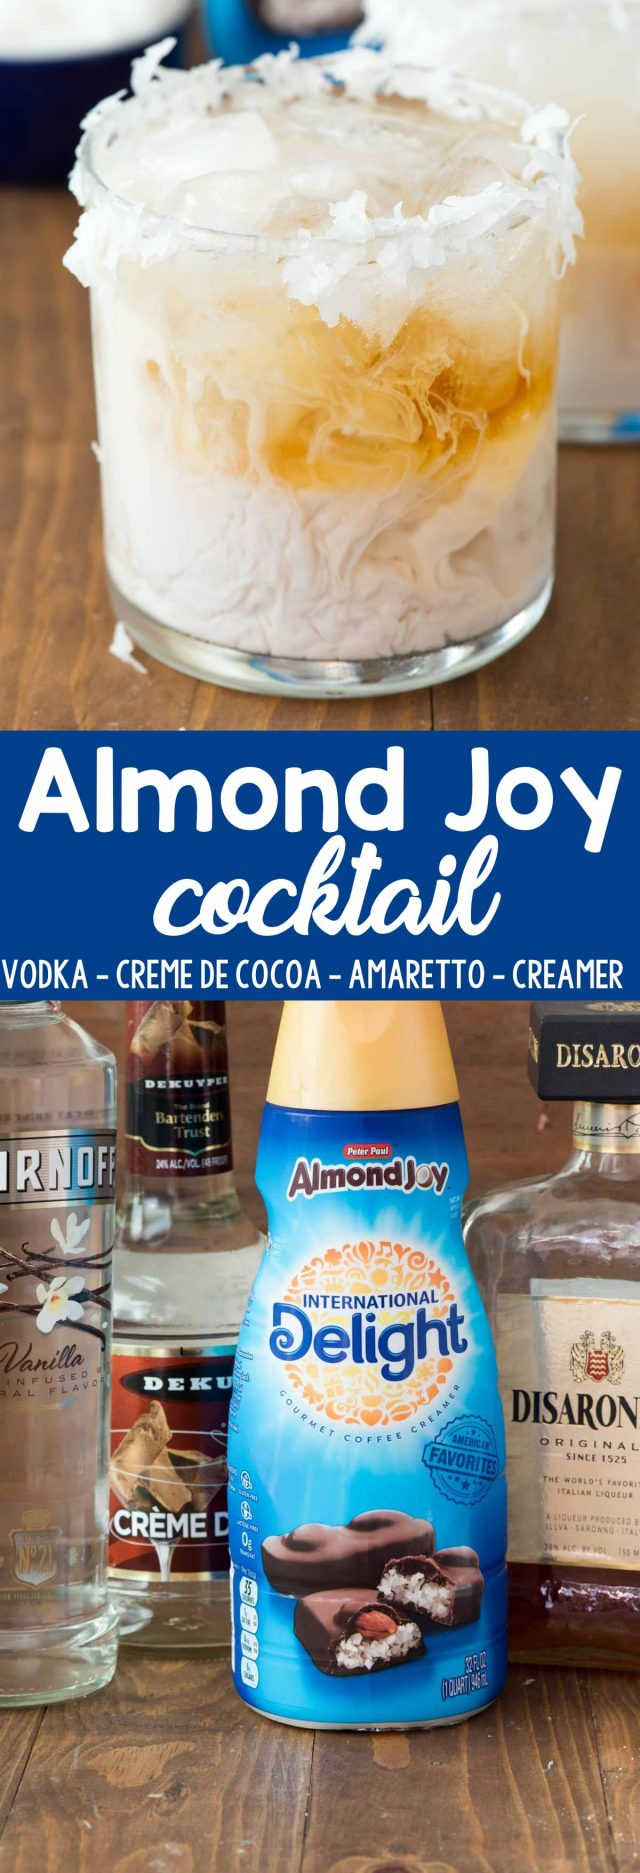 Almond Joy Cocktail - an easy cocktail recipe that tastes like an Almond Joy Candy Bar! Vodka, amaretto, creme de cocoa, and Almond Joy Coffee Creamer make one tasty drink!